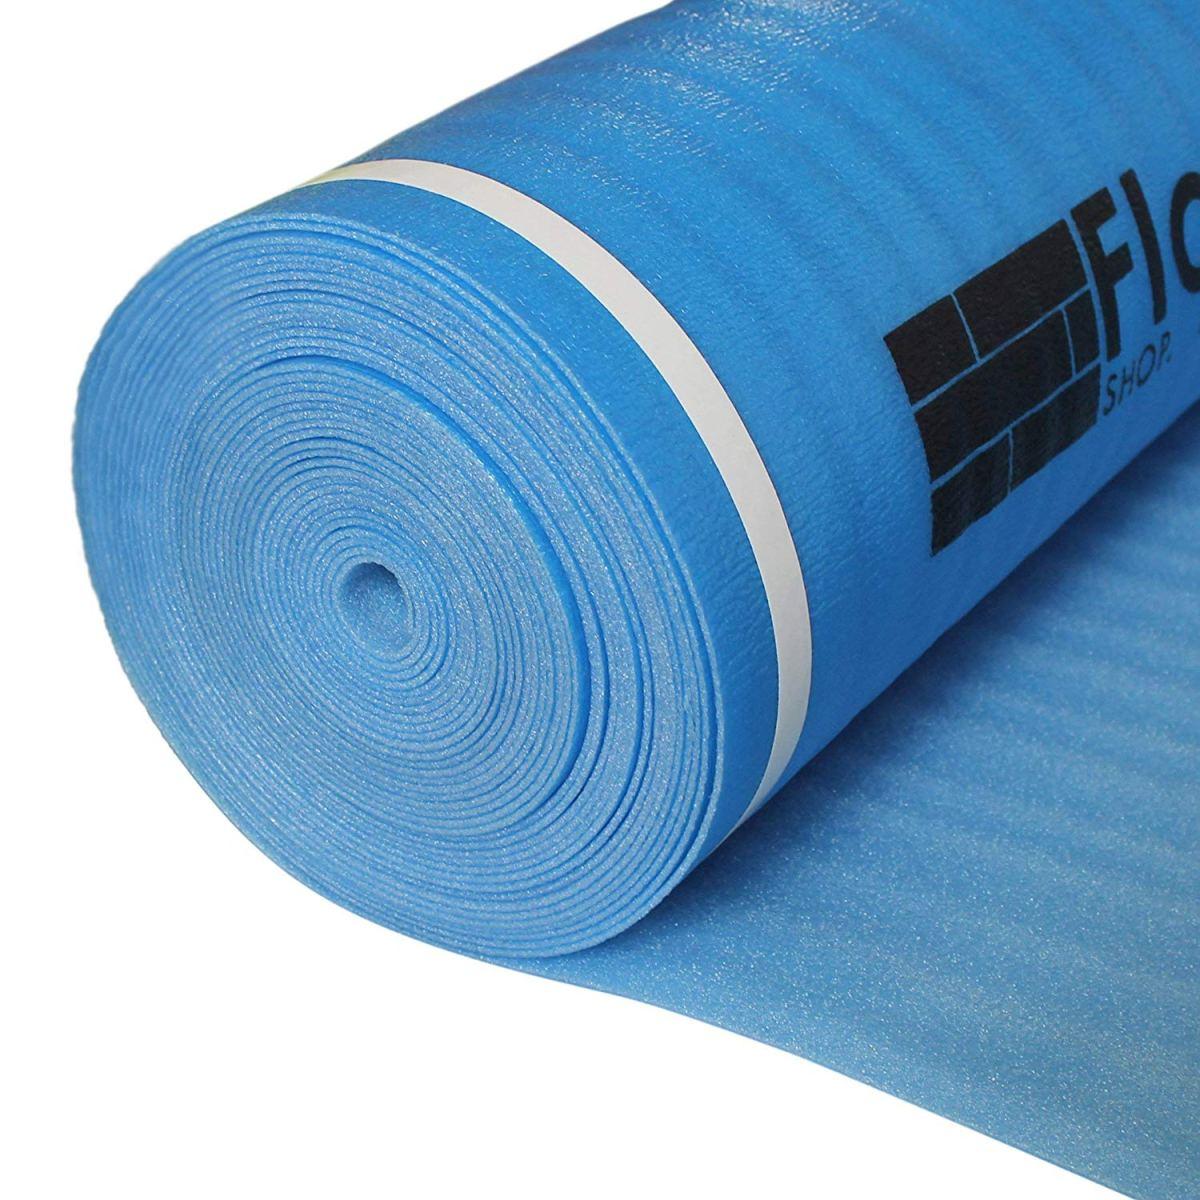 Floorlot 174 Blue Laminate Flooring Underlayment With